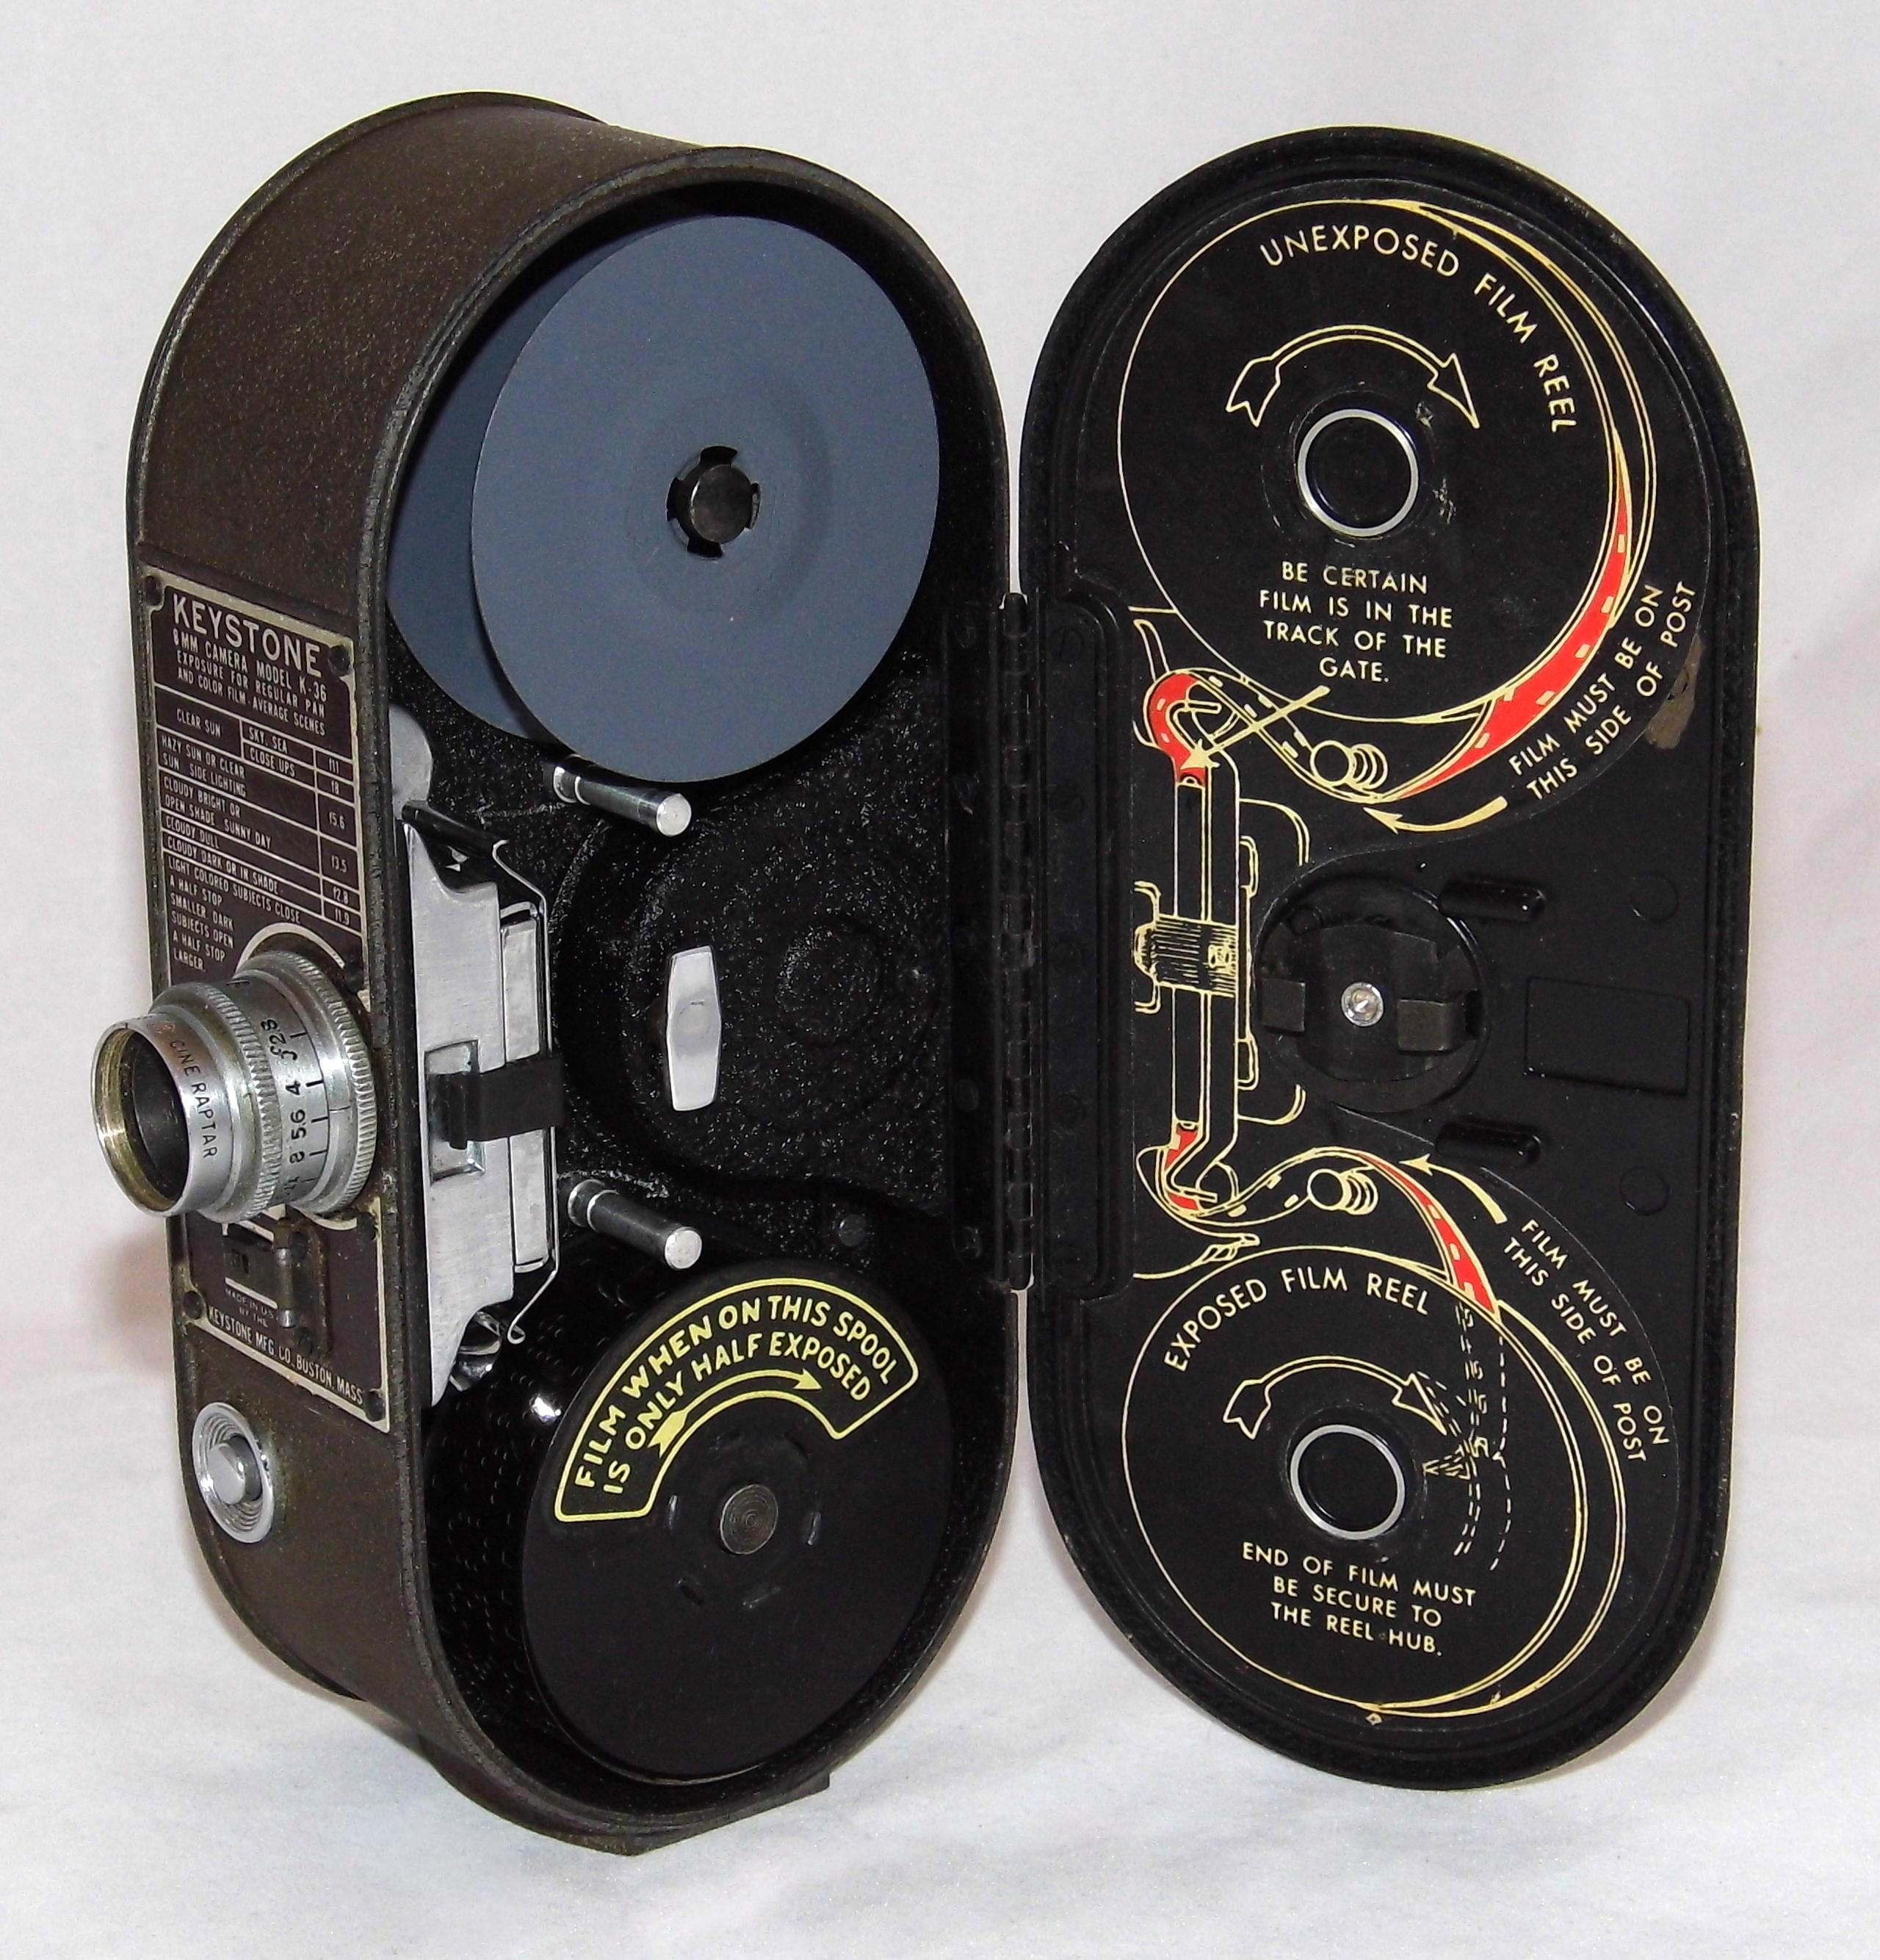 File:Vintage Keystone 8mm Home Movie Camera, Model K-36